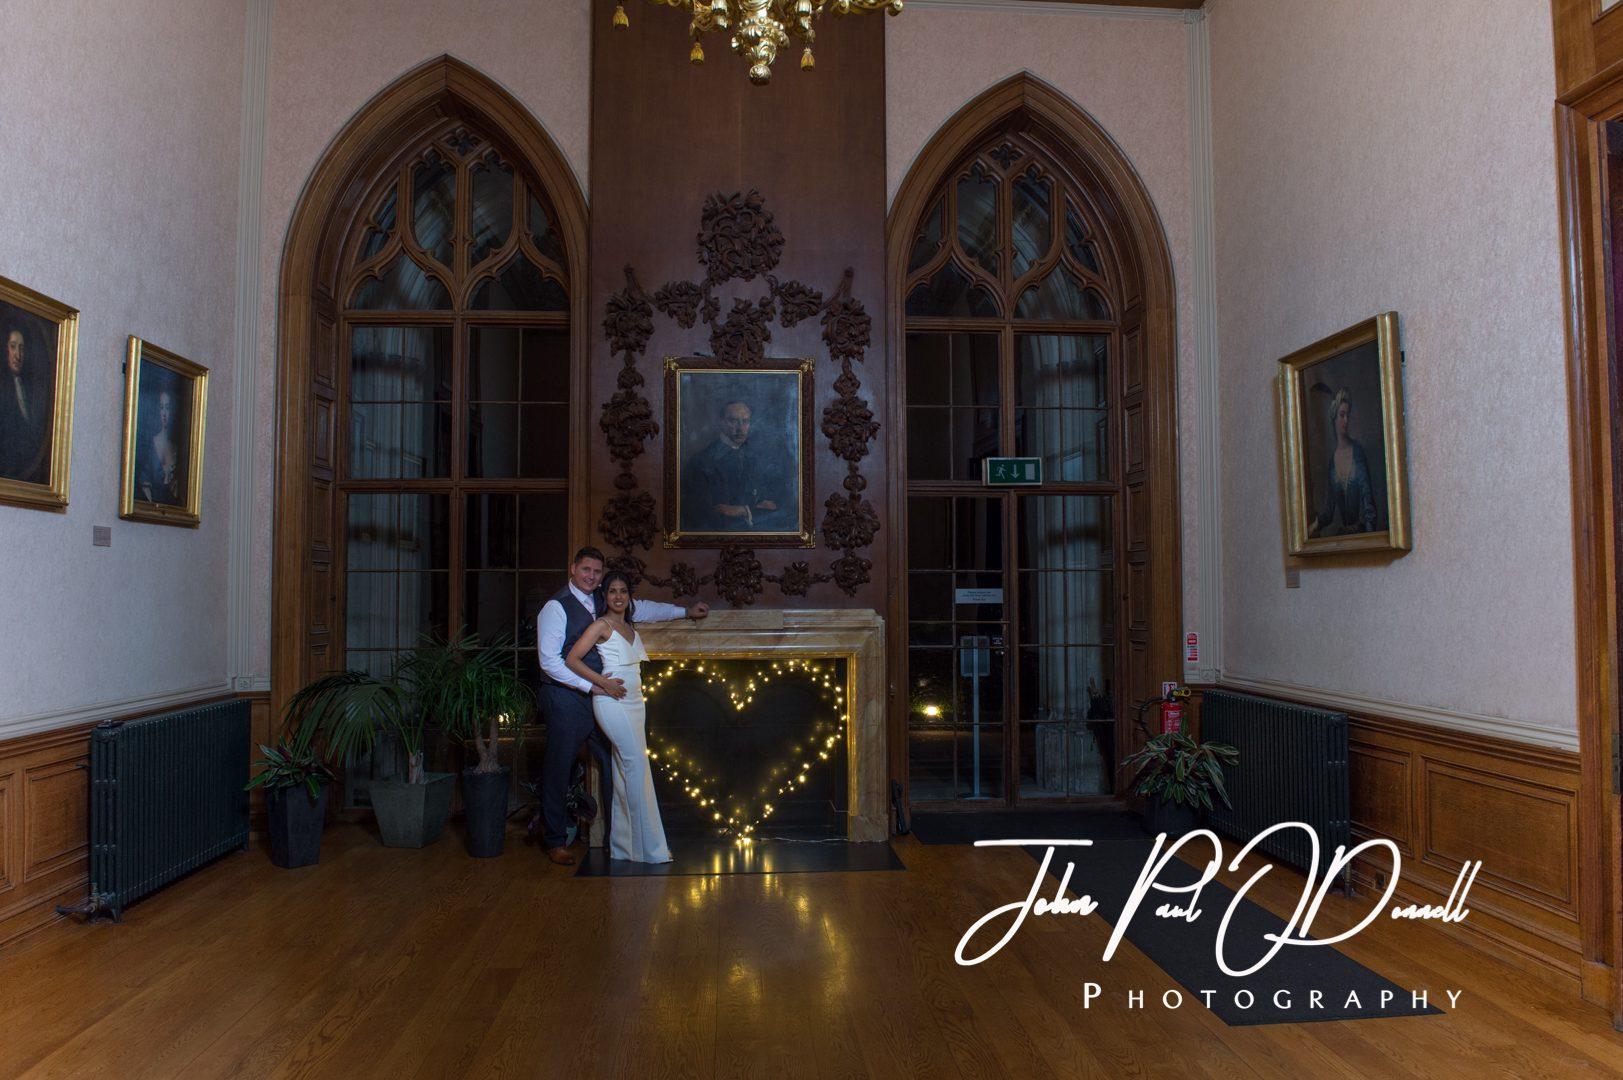 Lauren and Jonathans wedding at Ashridge House